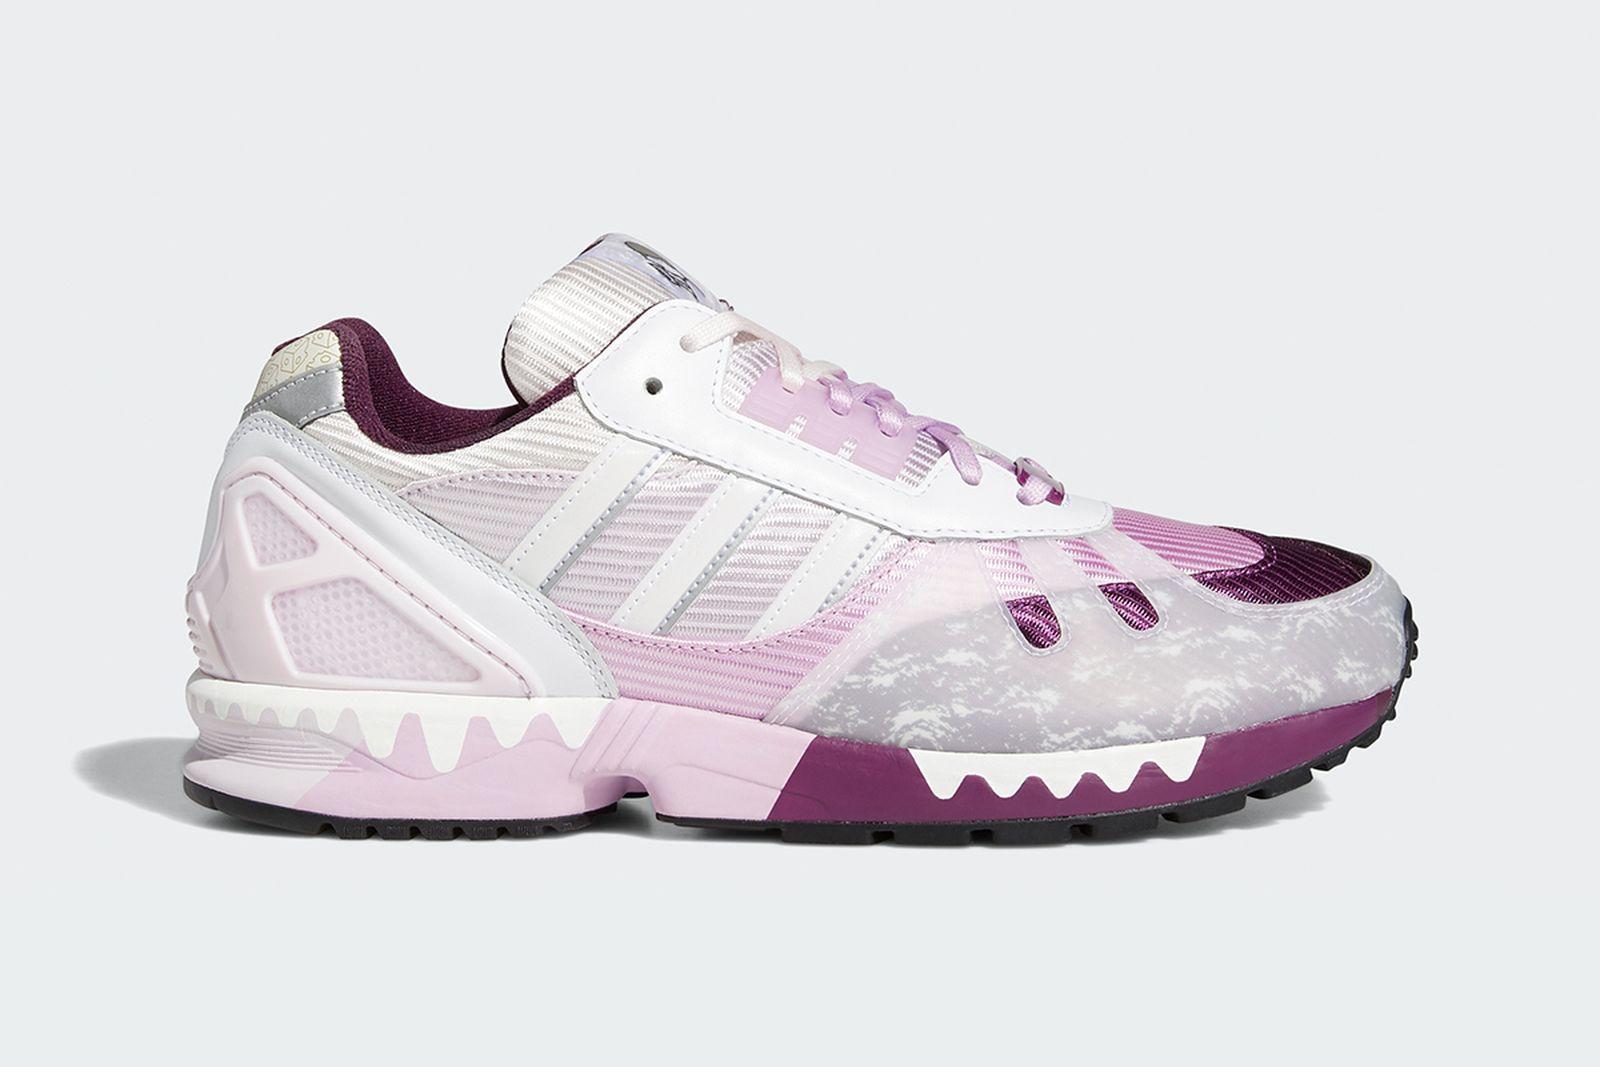 adidas-heytea-zx-7000-release-date-price-04